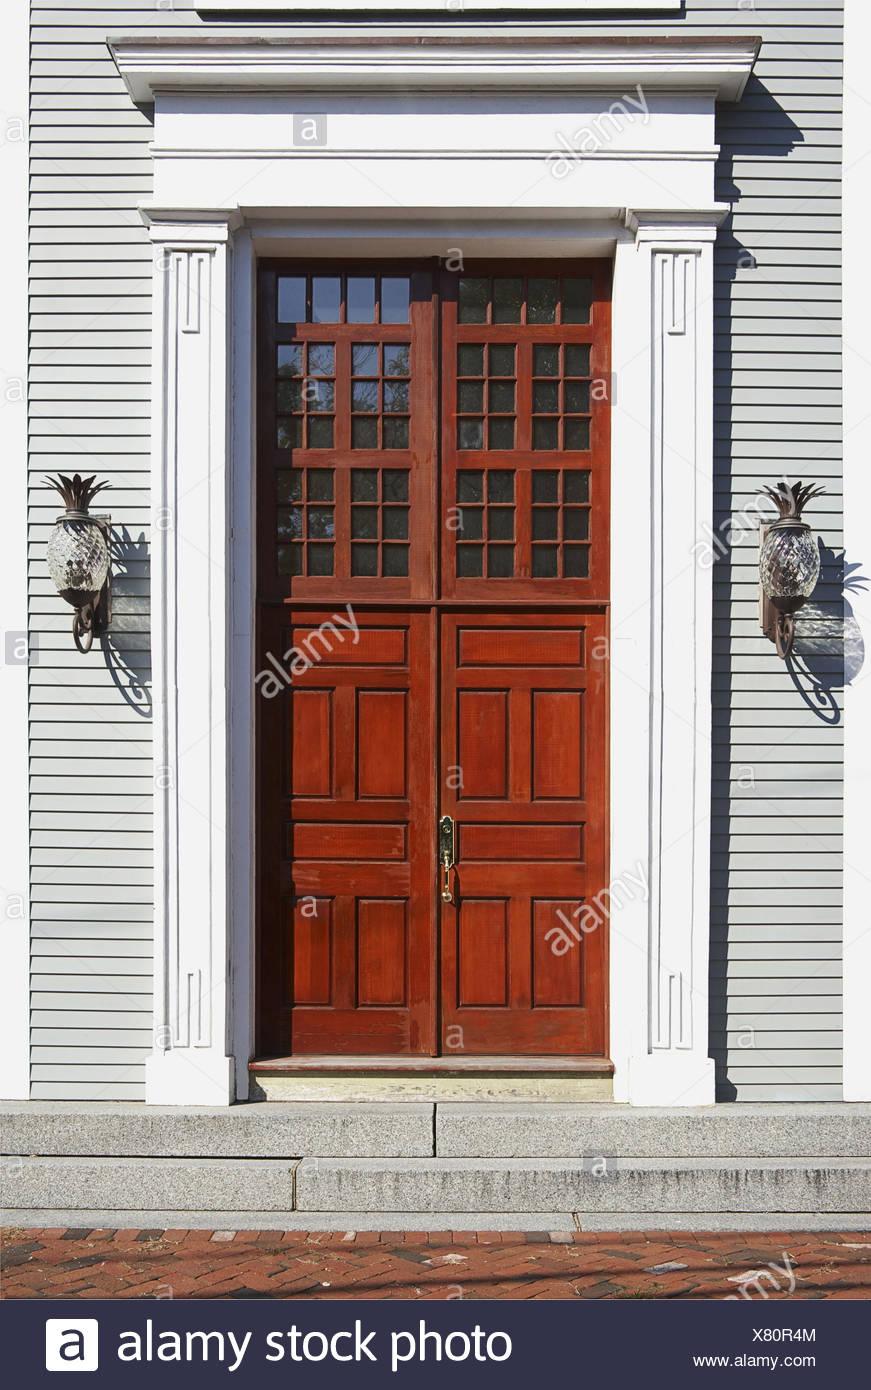 Incroyable Front Door And Doorway Of Home, Sandwich, Cape Cod, Massachusetts, New  England, USA